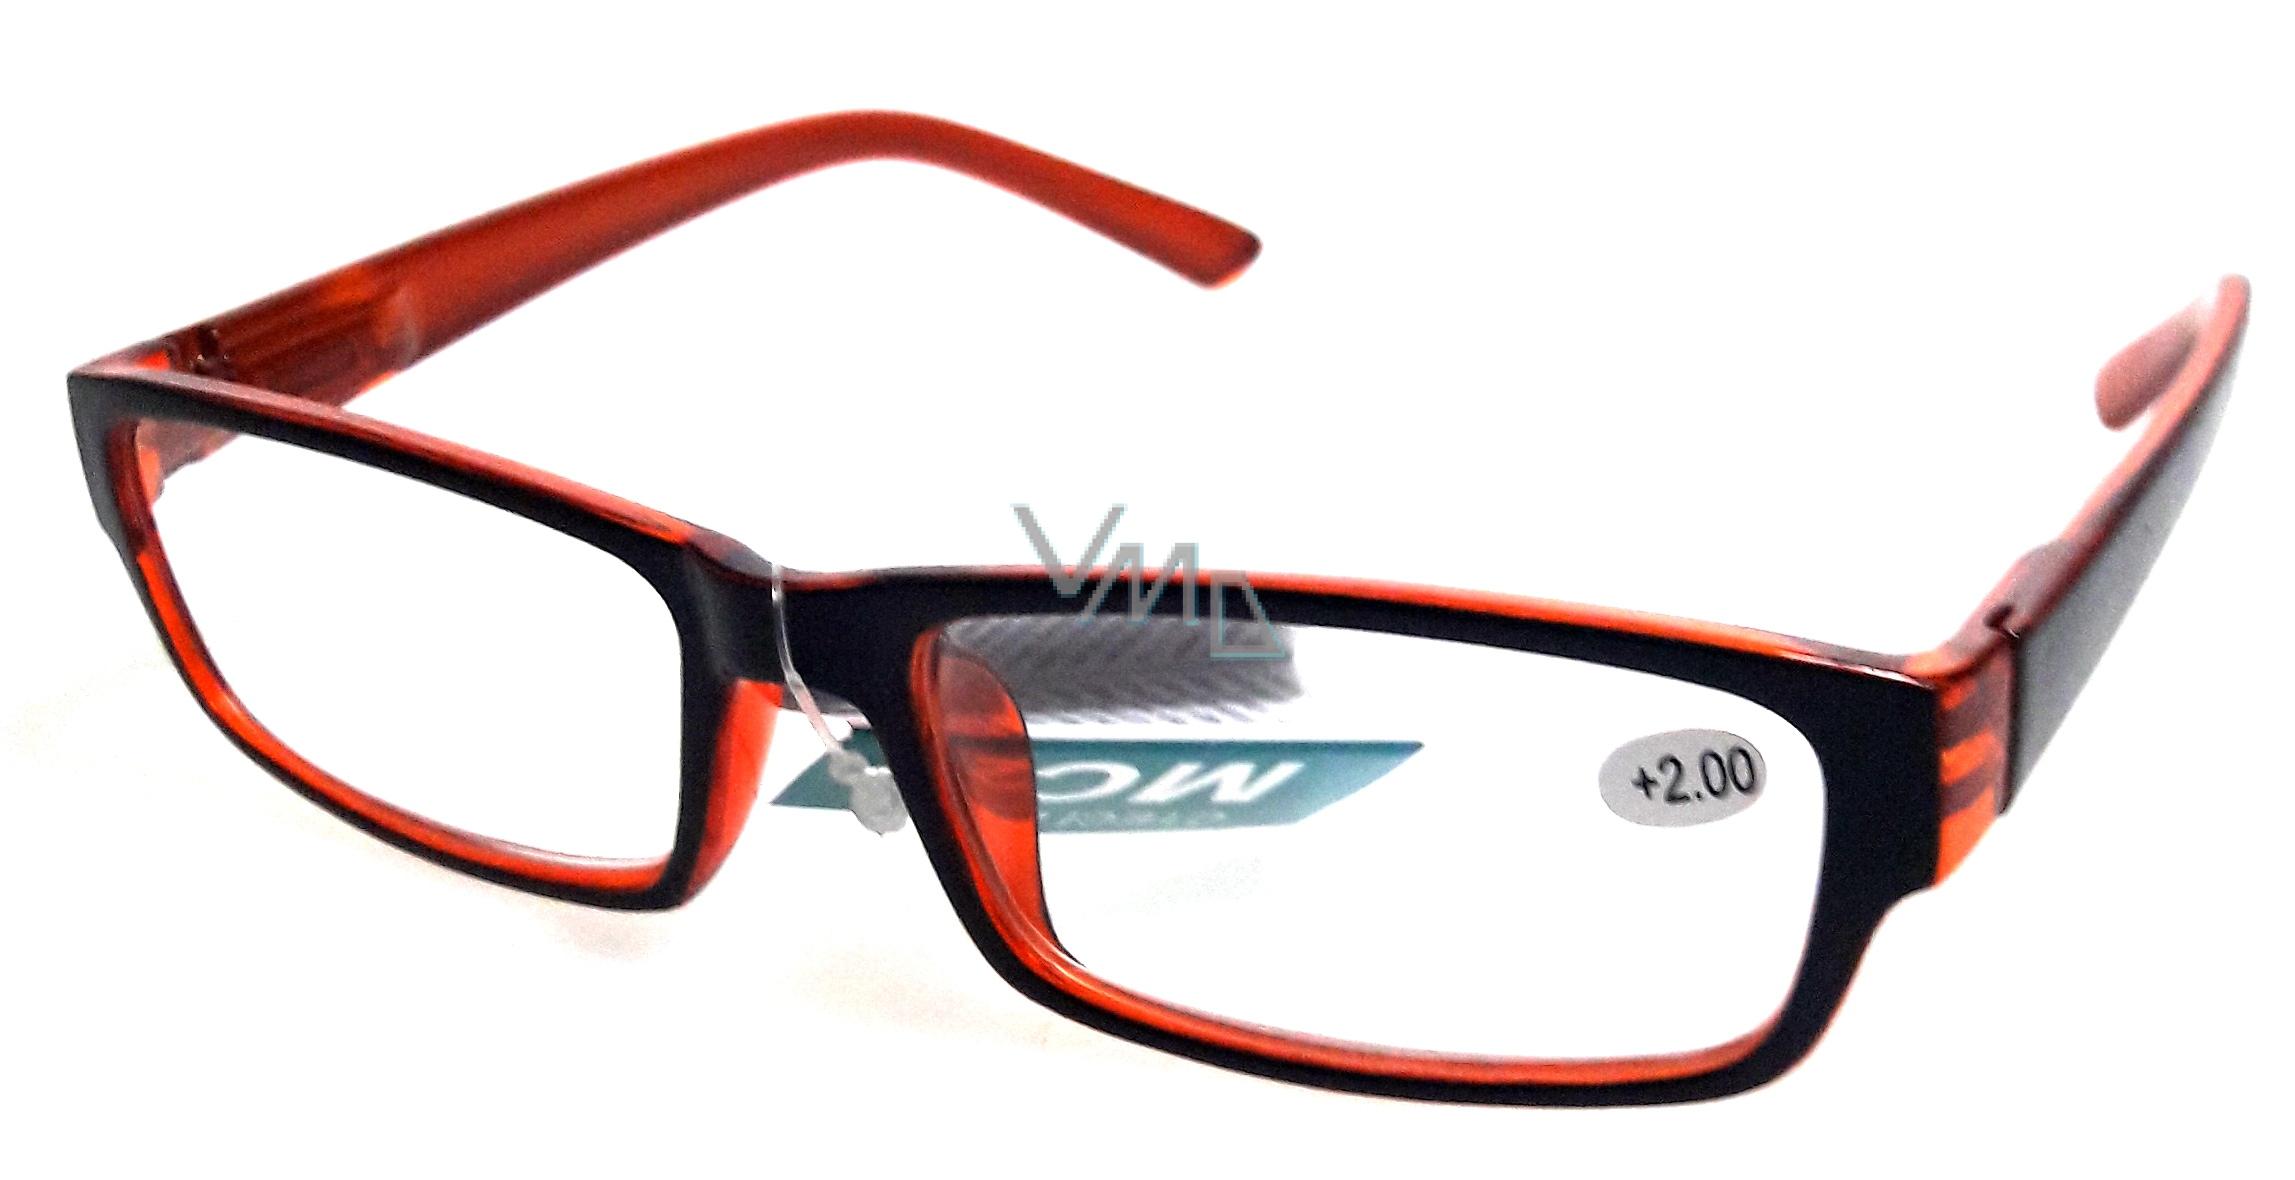 Gläser Dioplast + 2,5 schwarz MC2062